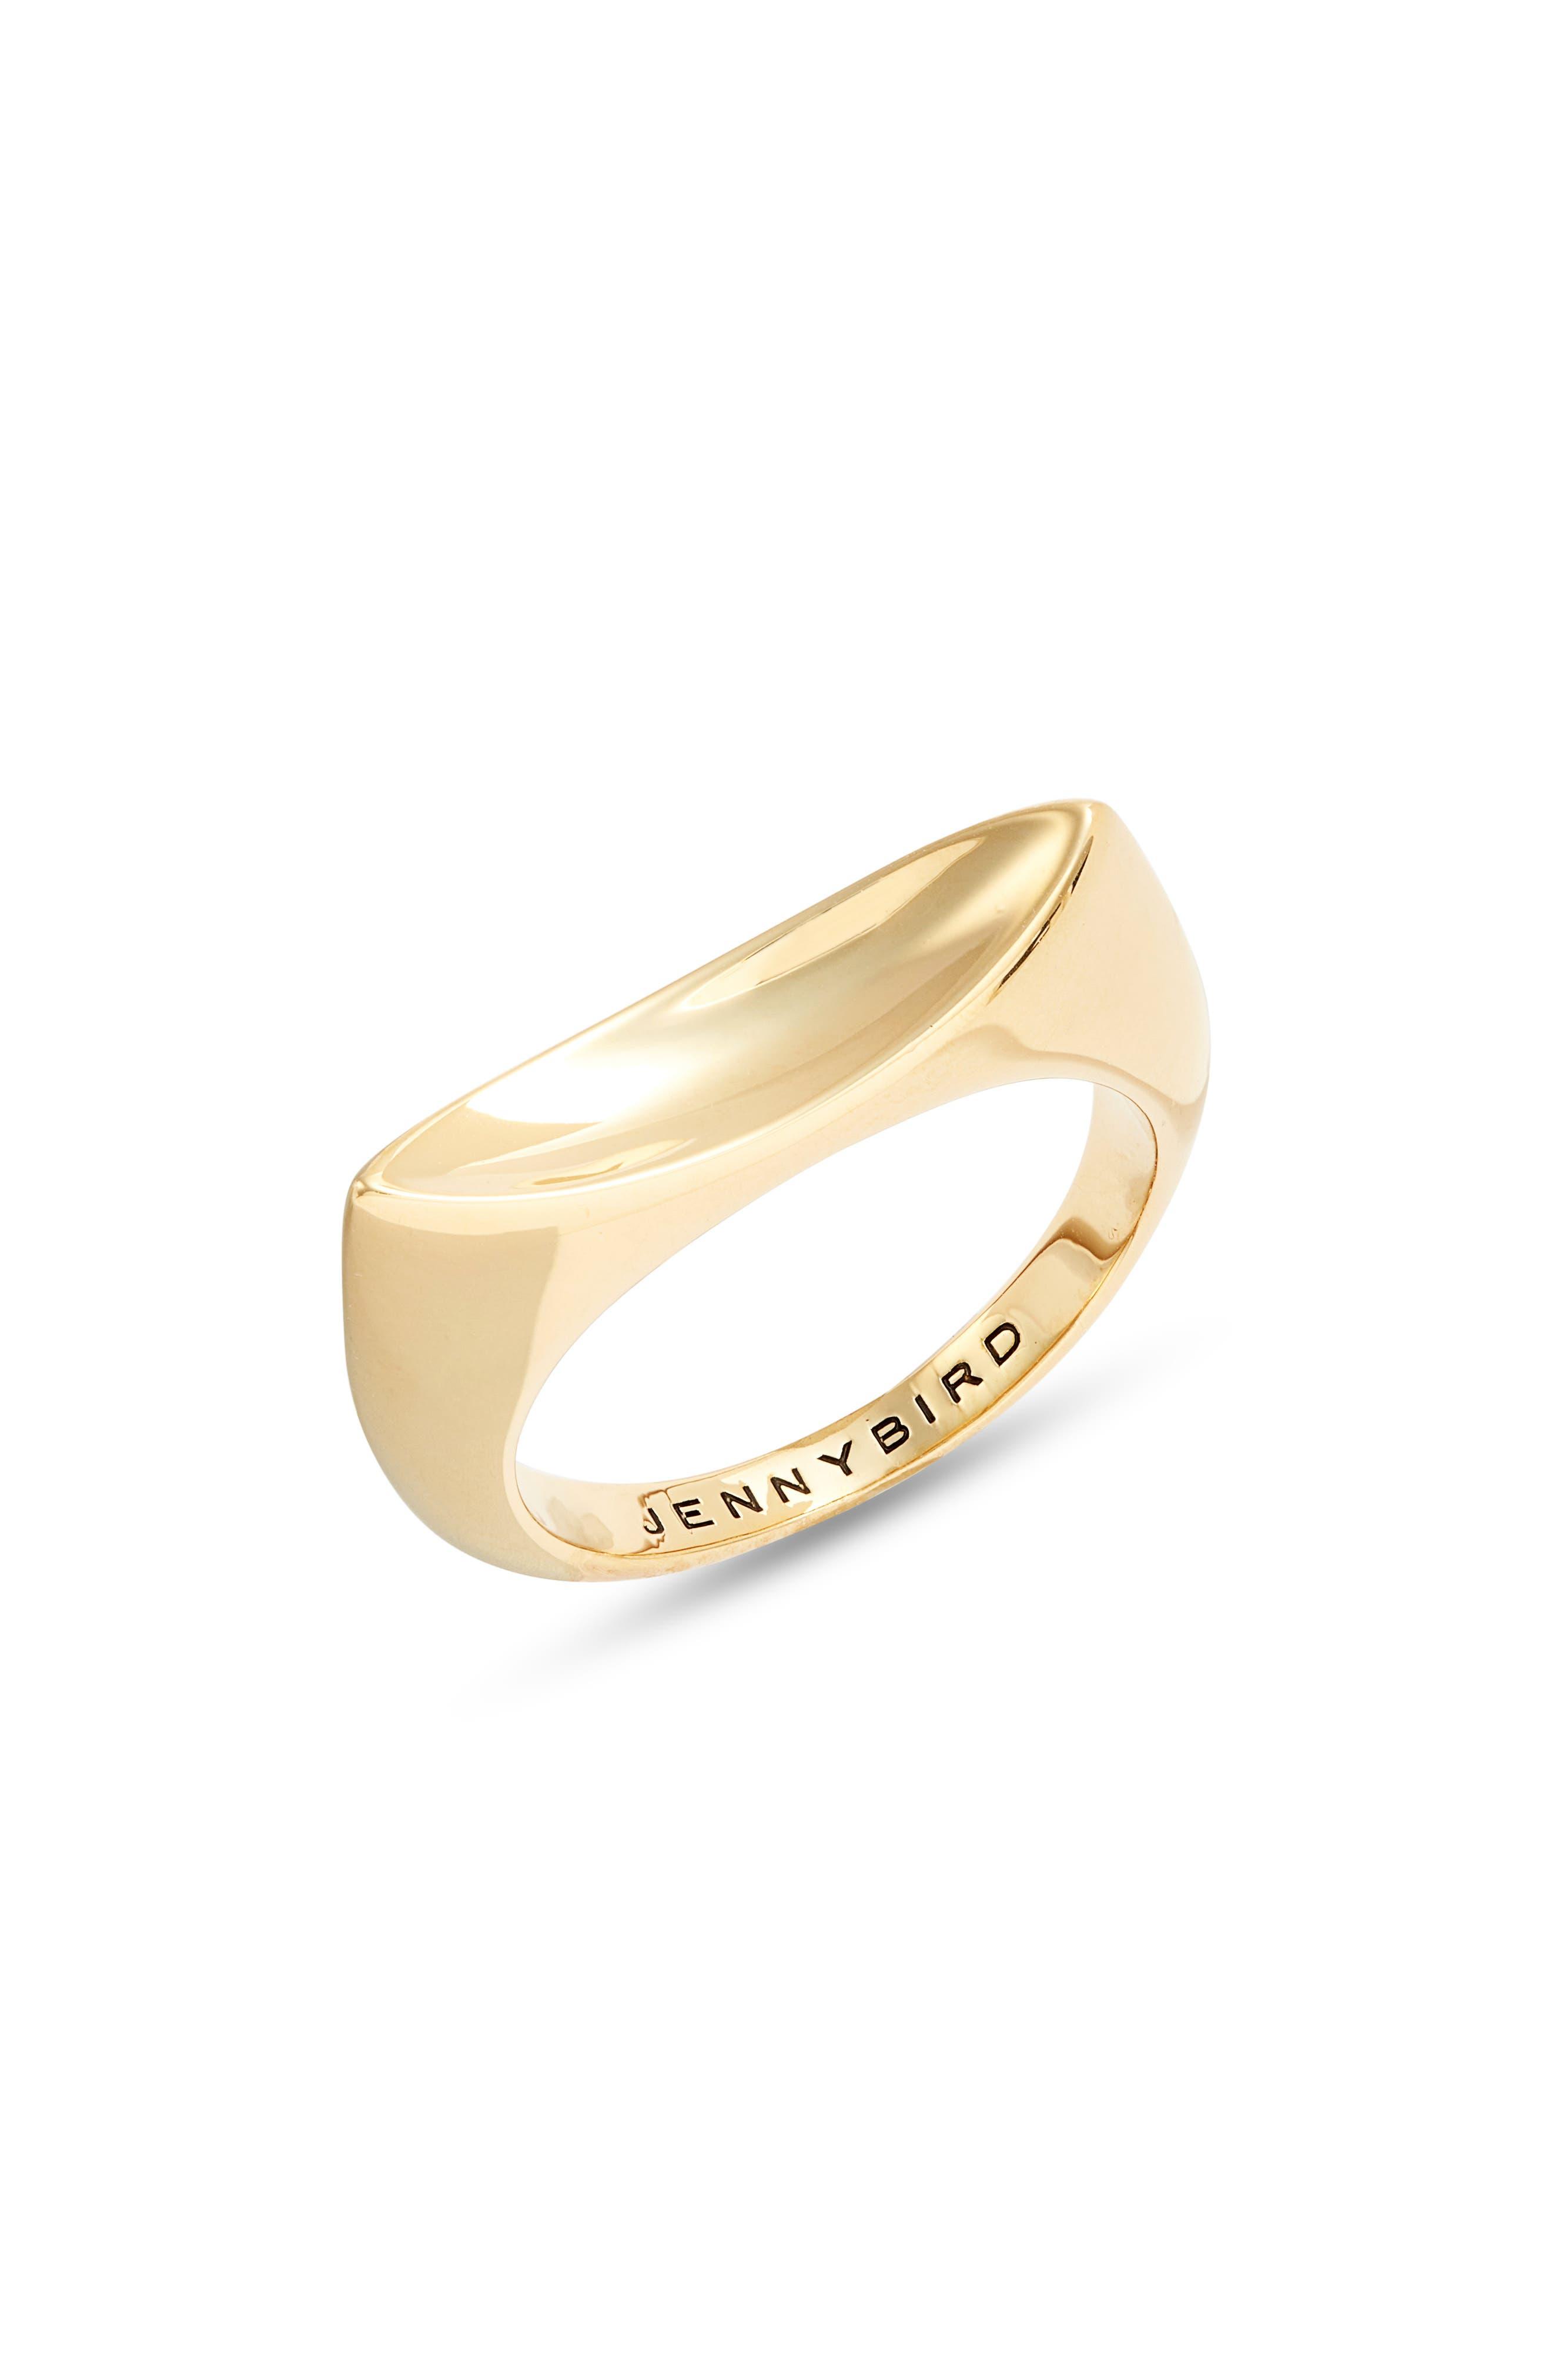 Clean Metals Statement Ring